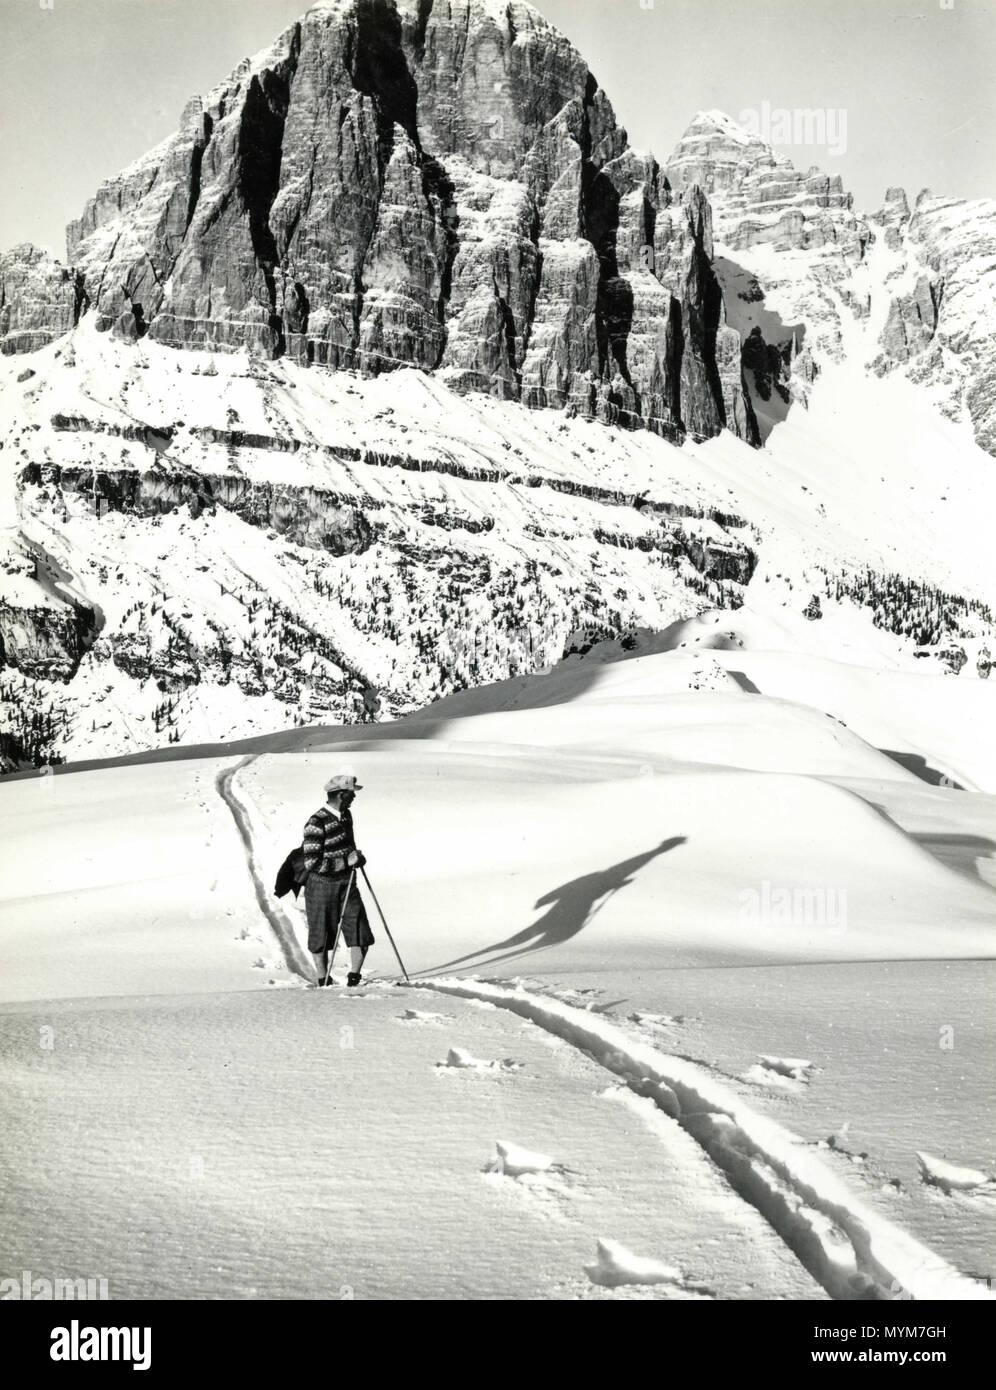 Walking on the snow, Dolomites, Italy 1930s - Stock Image